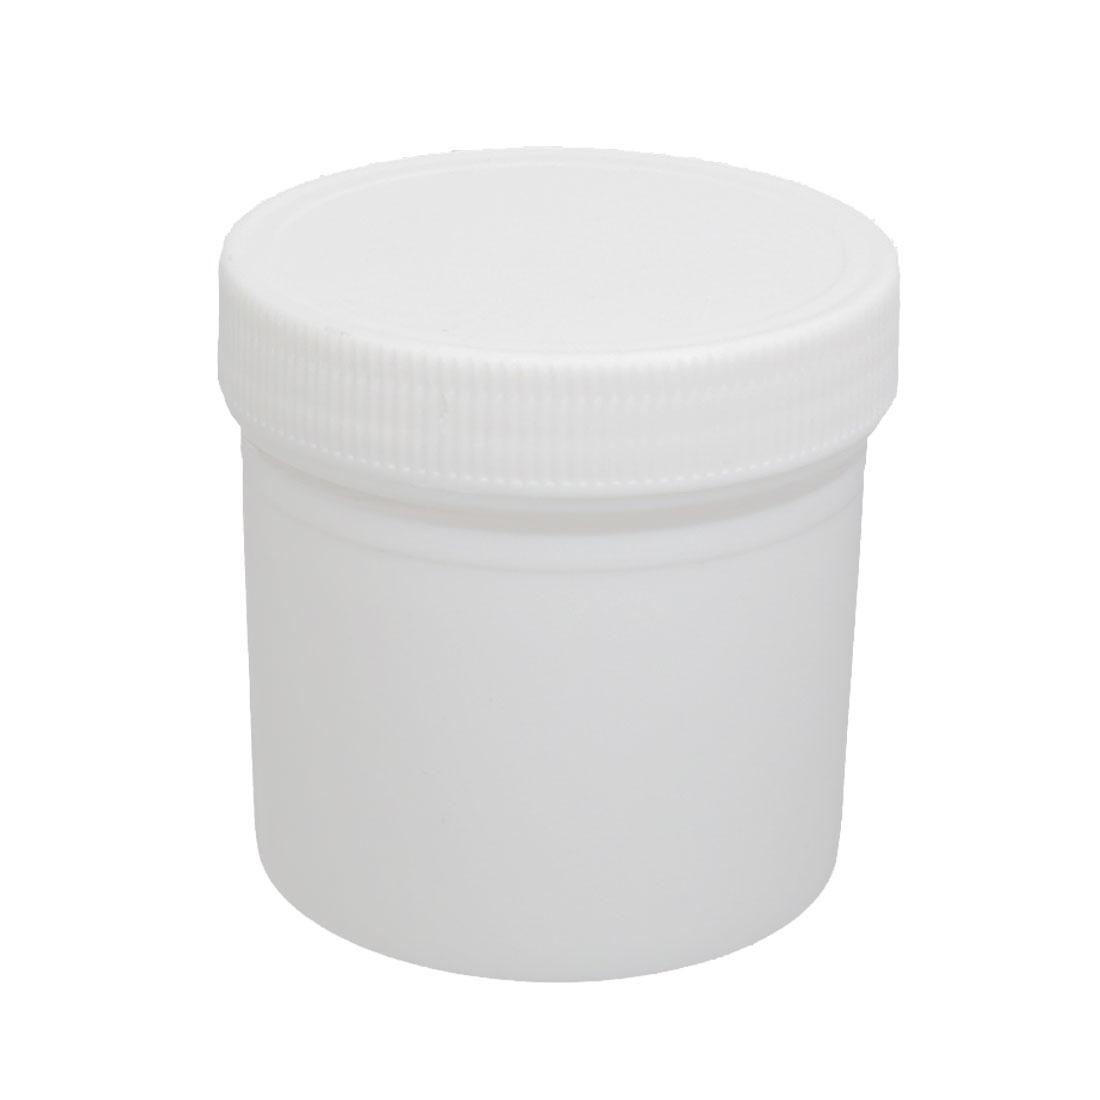 Plastic Screw Cap Cover Pill Tablet Capsule Container Empty Medicine Bottle White